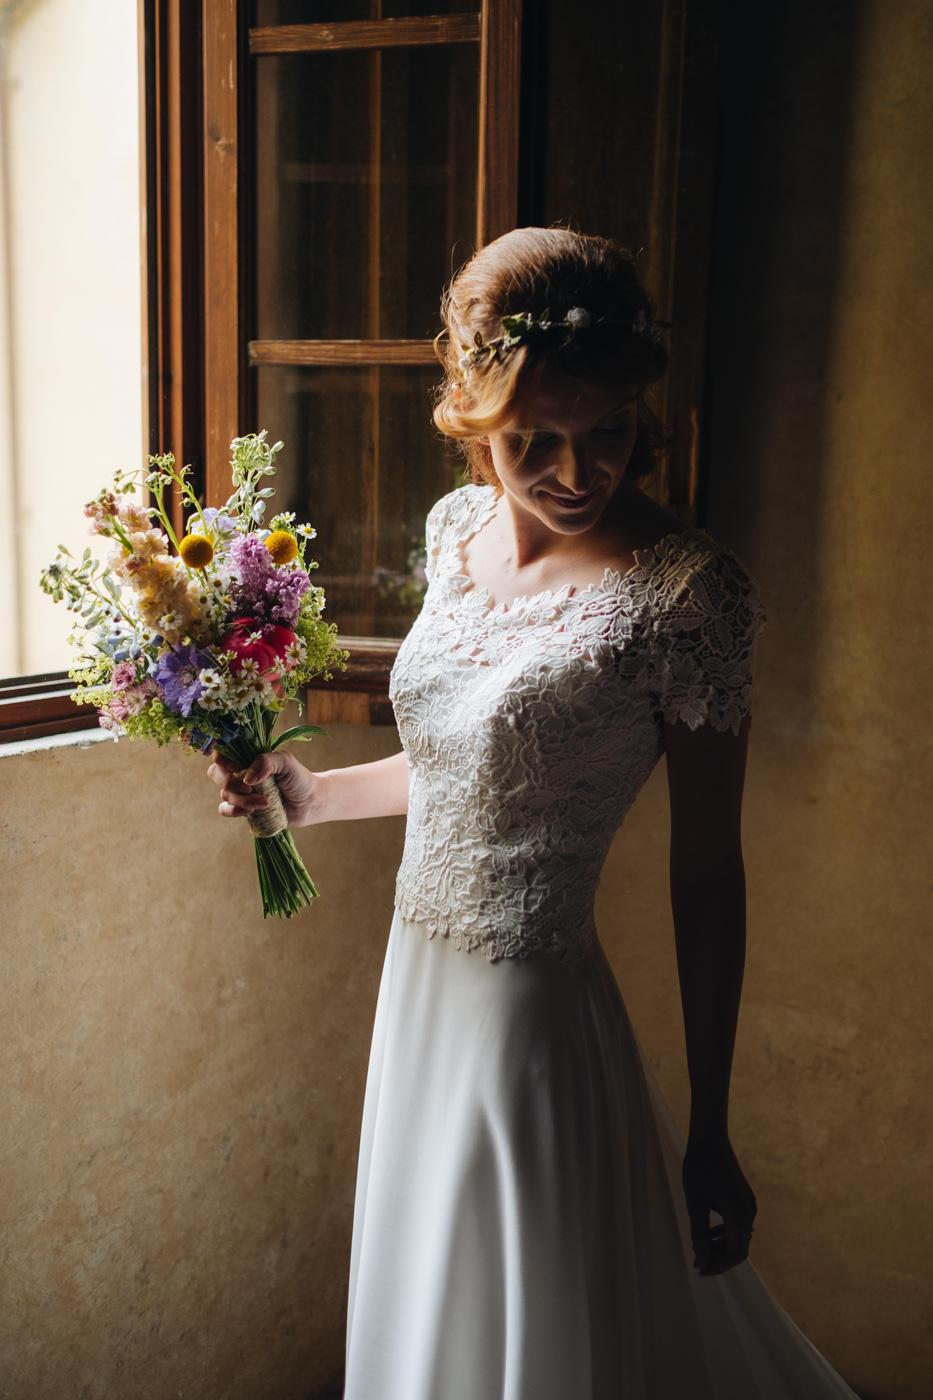 matrimoni_all_italiana_fotografo_matrimonio_toscana-20.jpg